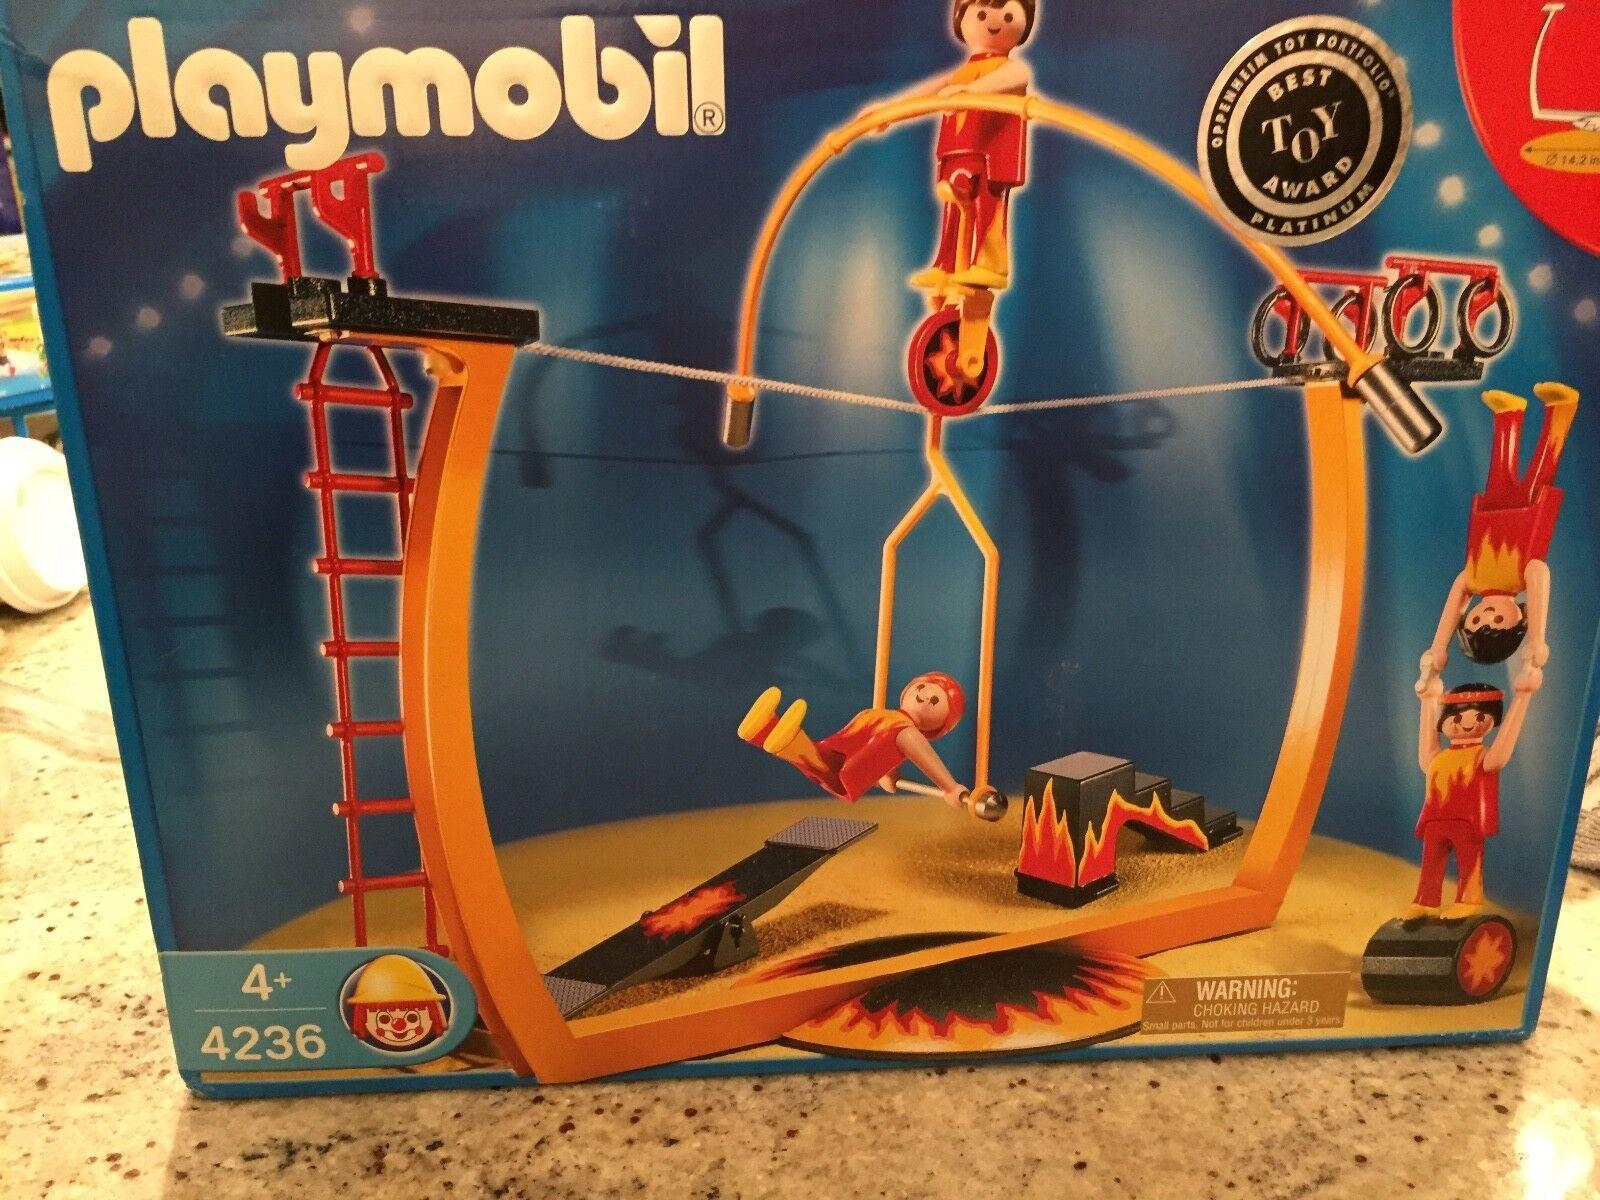 NIB - NEW NEVER OPENED Playmobil Circus Tightrope Acrobat Set Set Set Unicycle Set 5fe49b